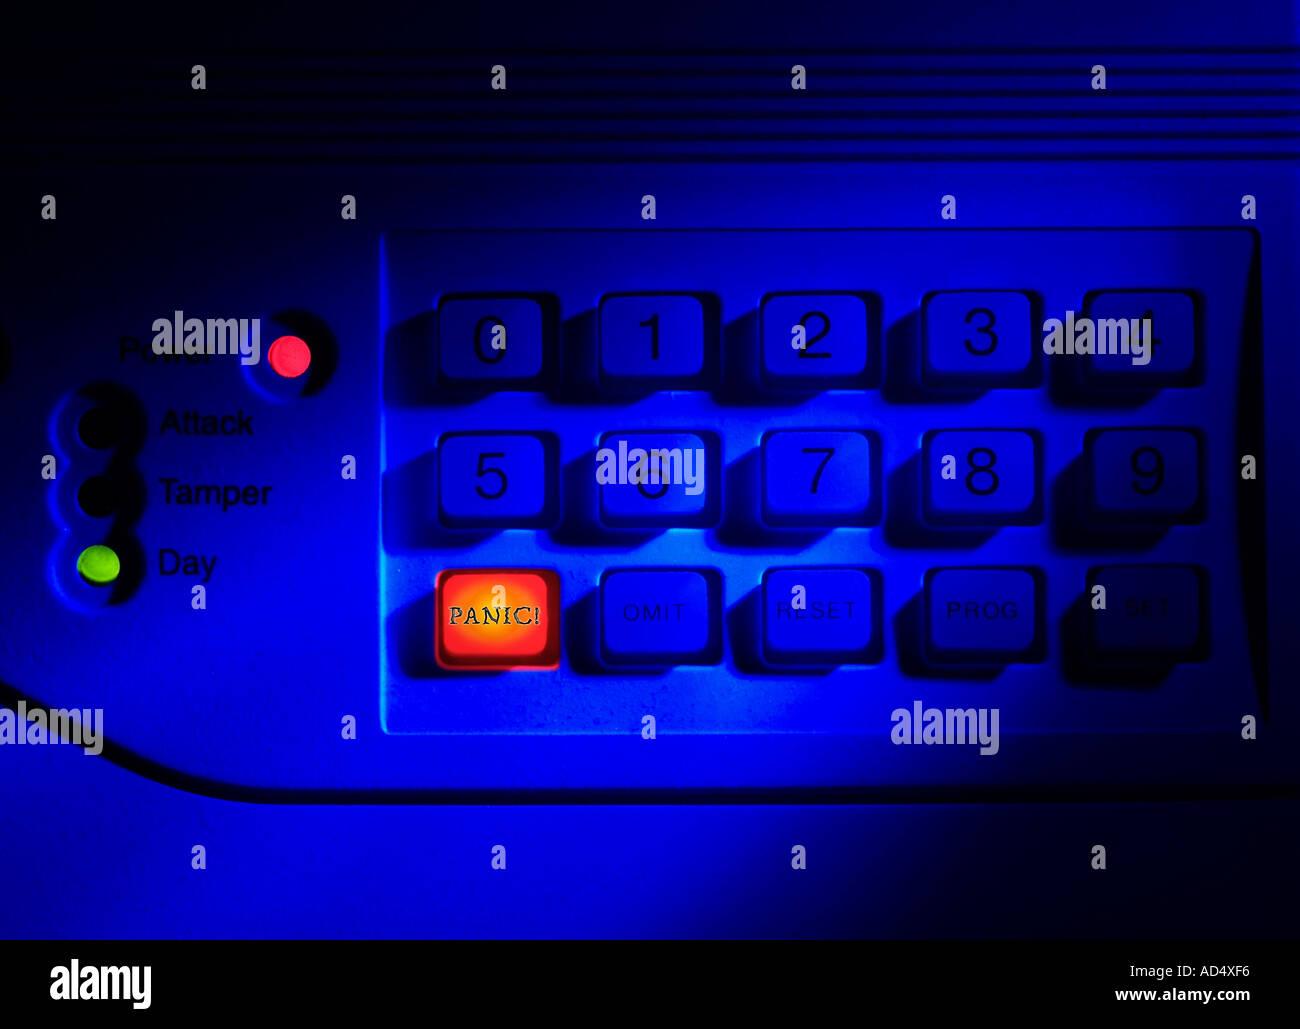 Burglar Alarm Control Panel Stock Photos Keypad With Panic Button Illuminated Image